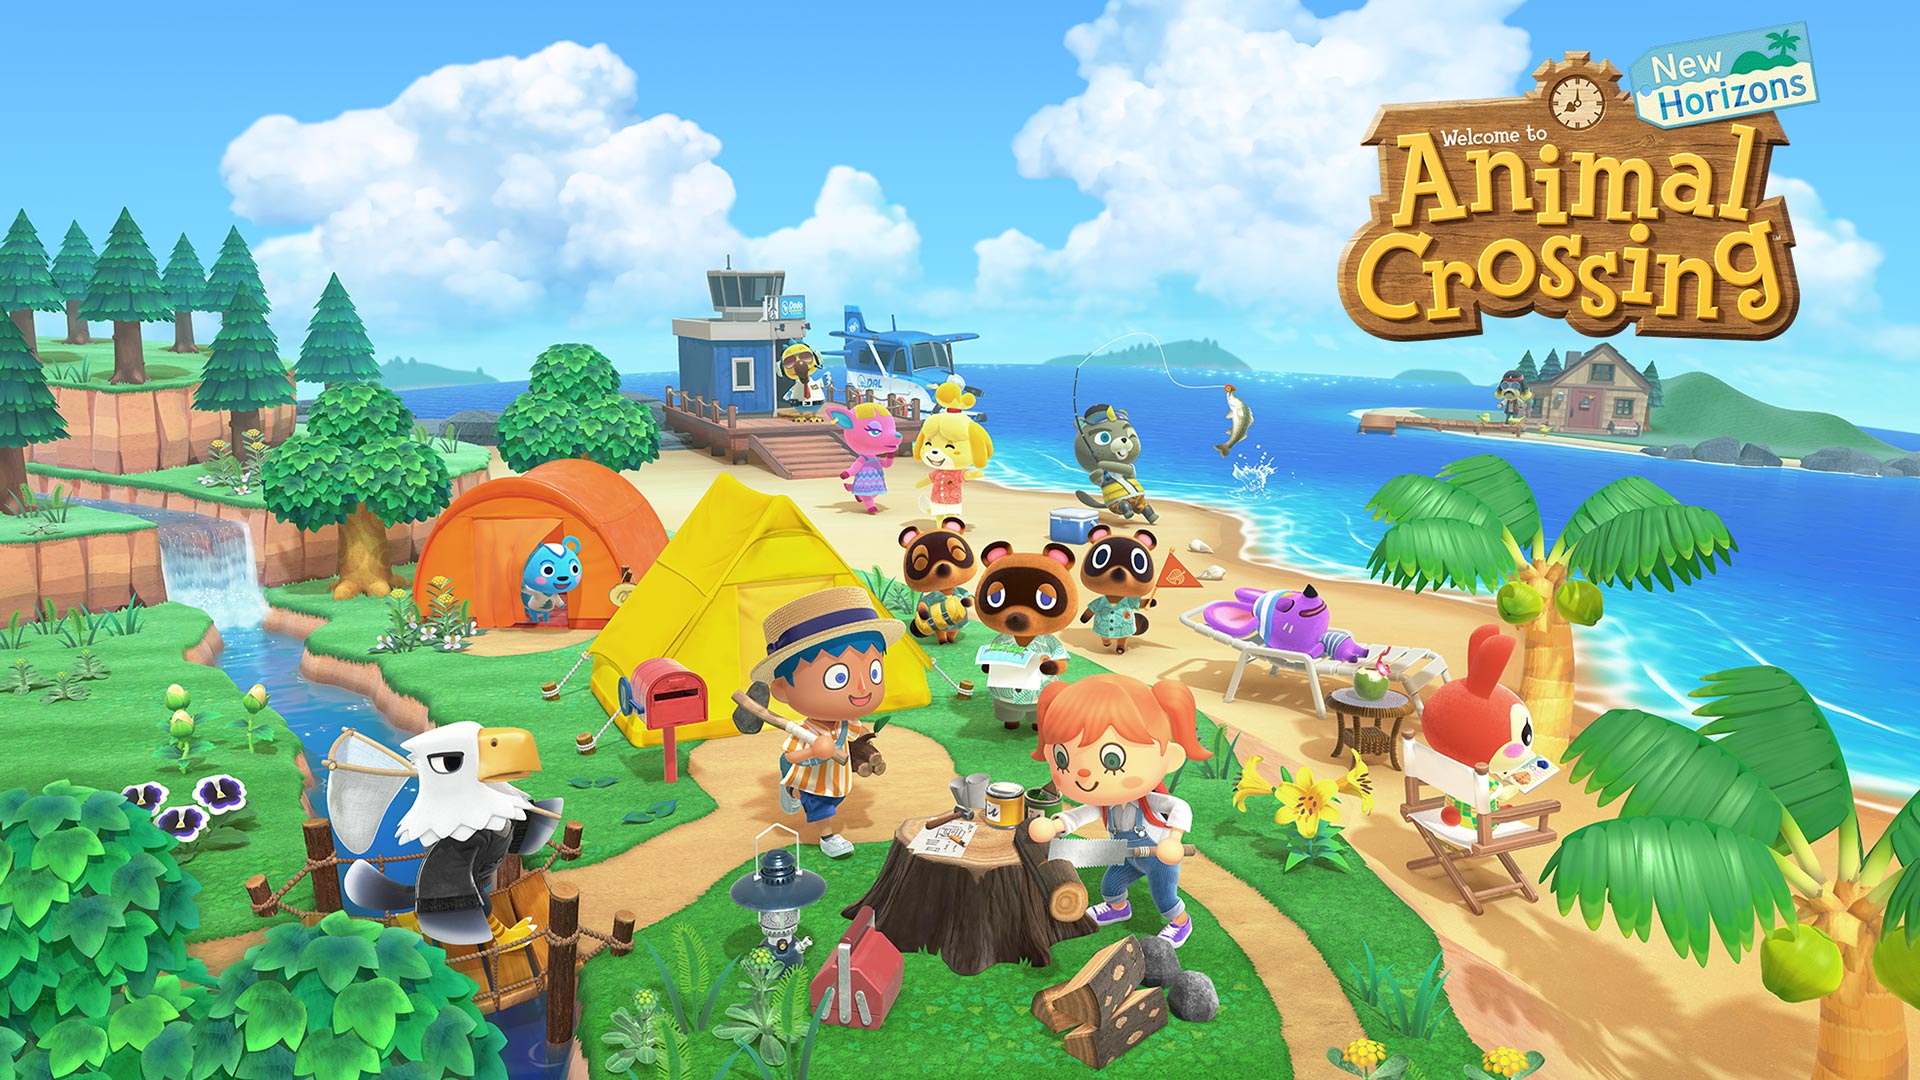 Animal Crossing: New Horizons Brooklyn Nine-Nine